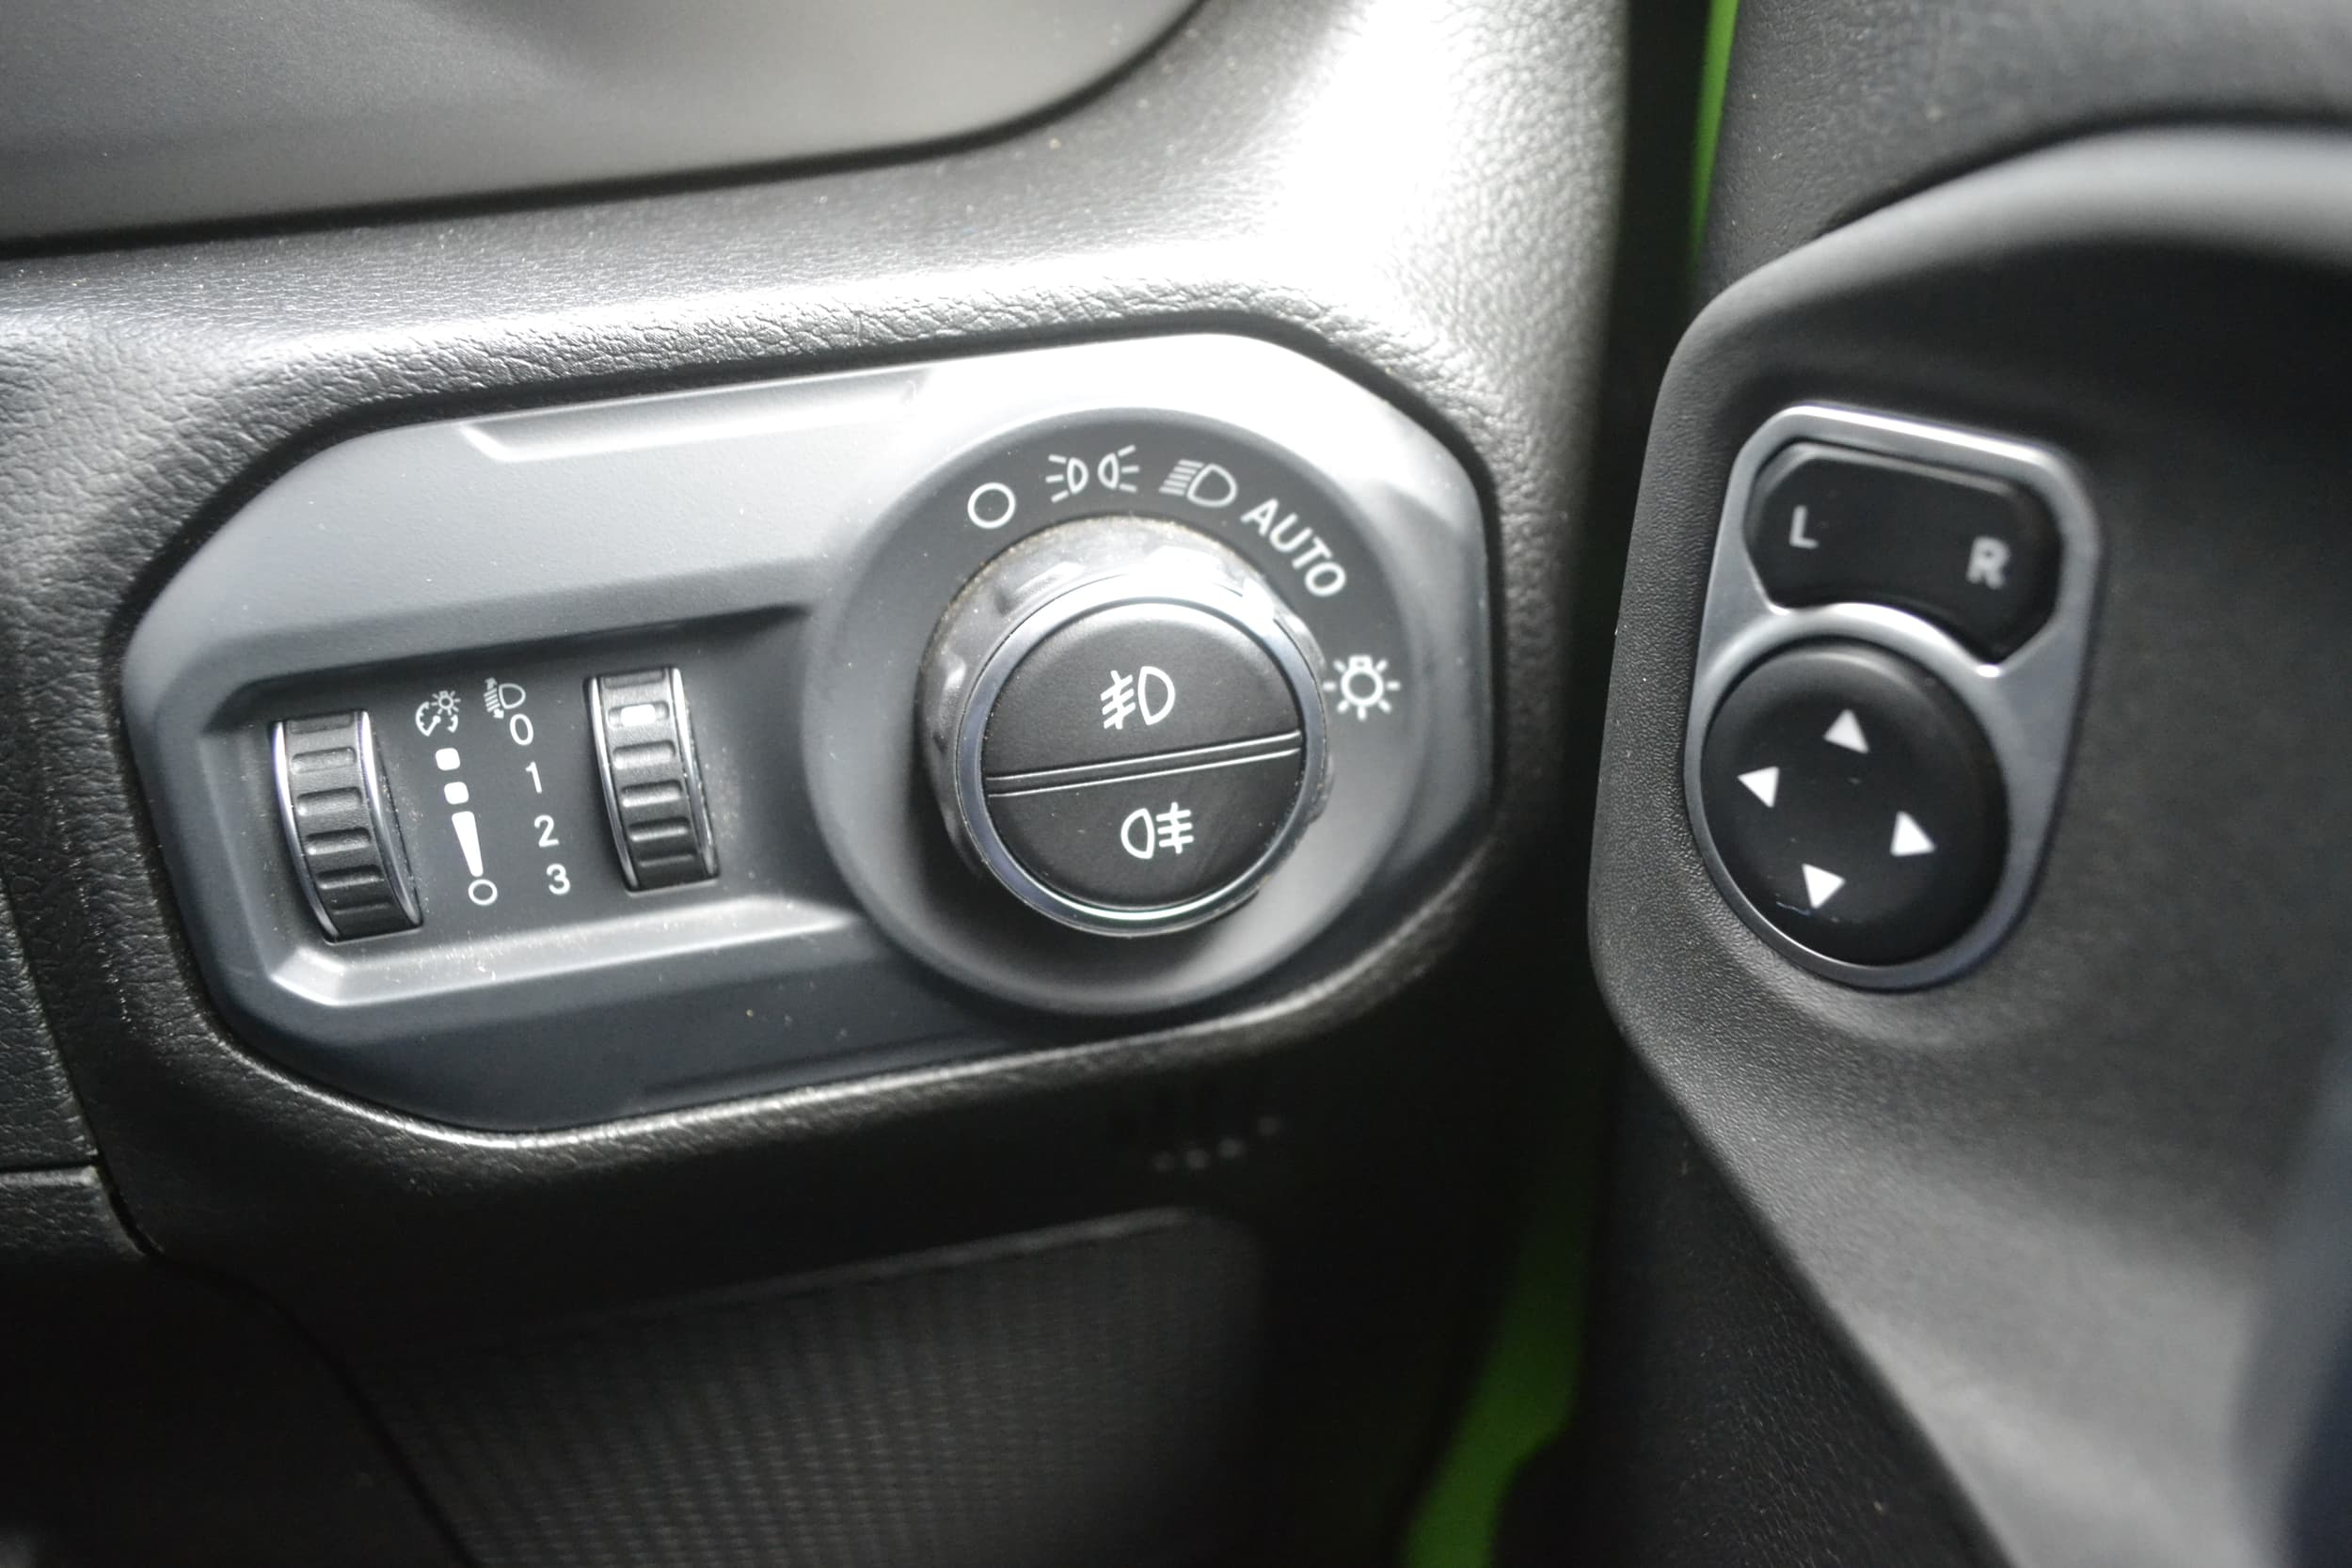 2019 Jeep Wrangler Unlimited Sport S Auto 4x4 MY19 - image 12